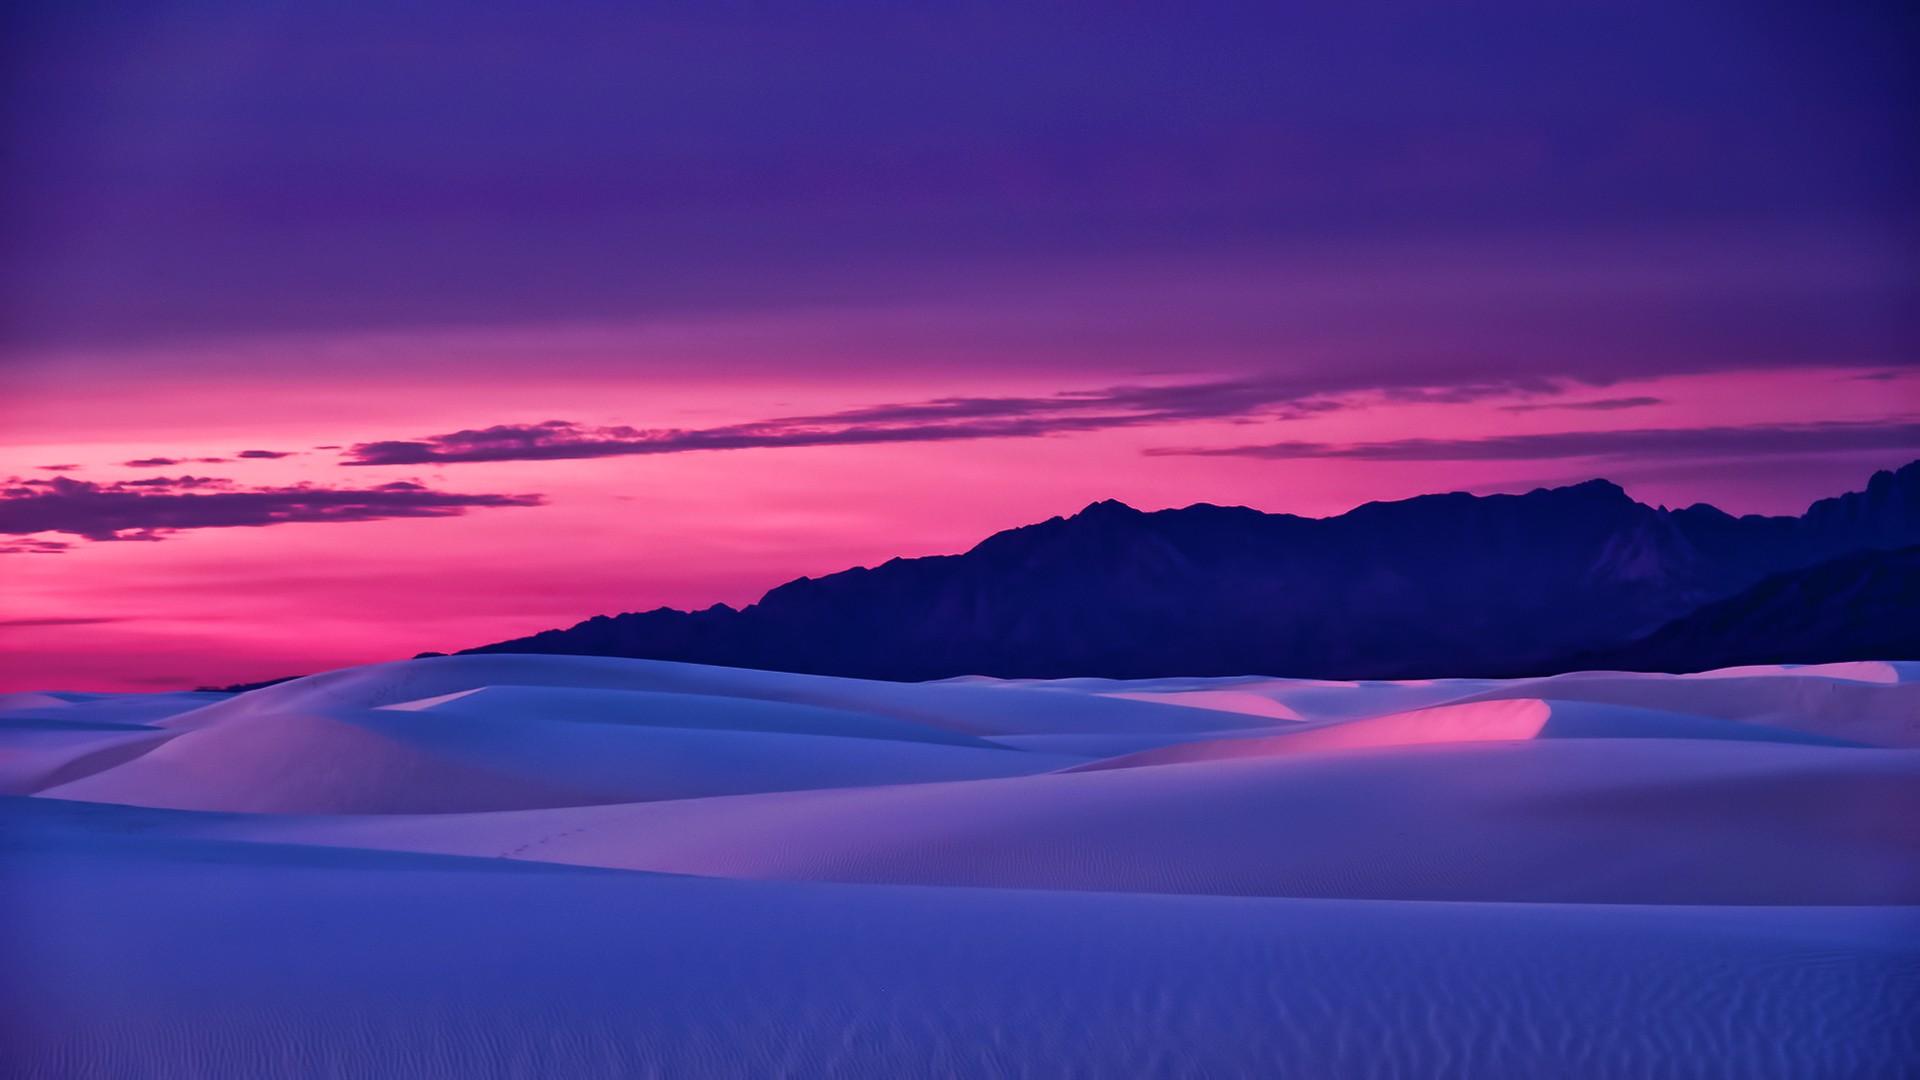 Landscape Mountains Sunset Sand Reflection Sky Sunrise Evening Morning Desert Horizon Atmosphere Arctic Dusk Plateau Cloud